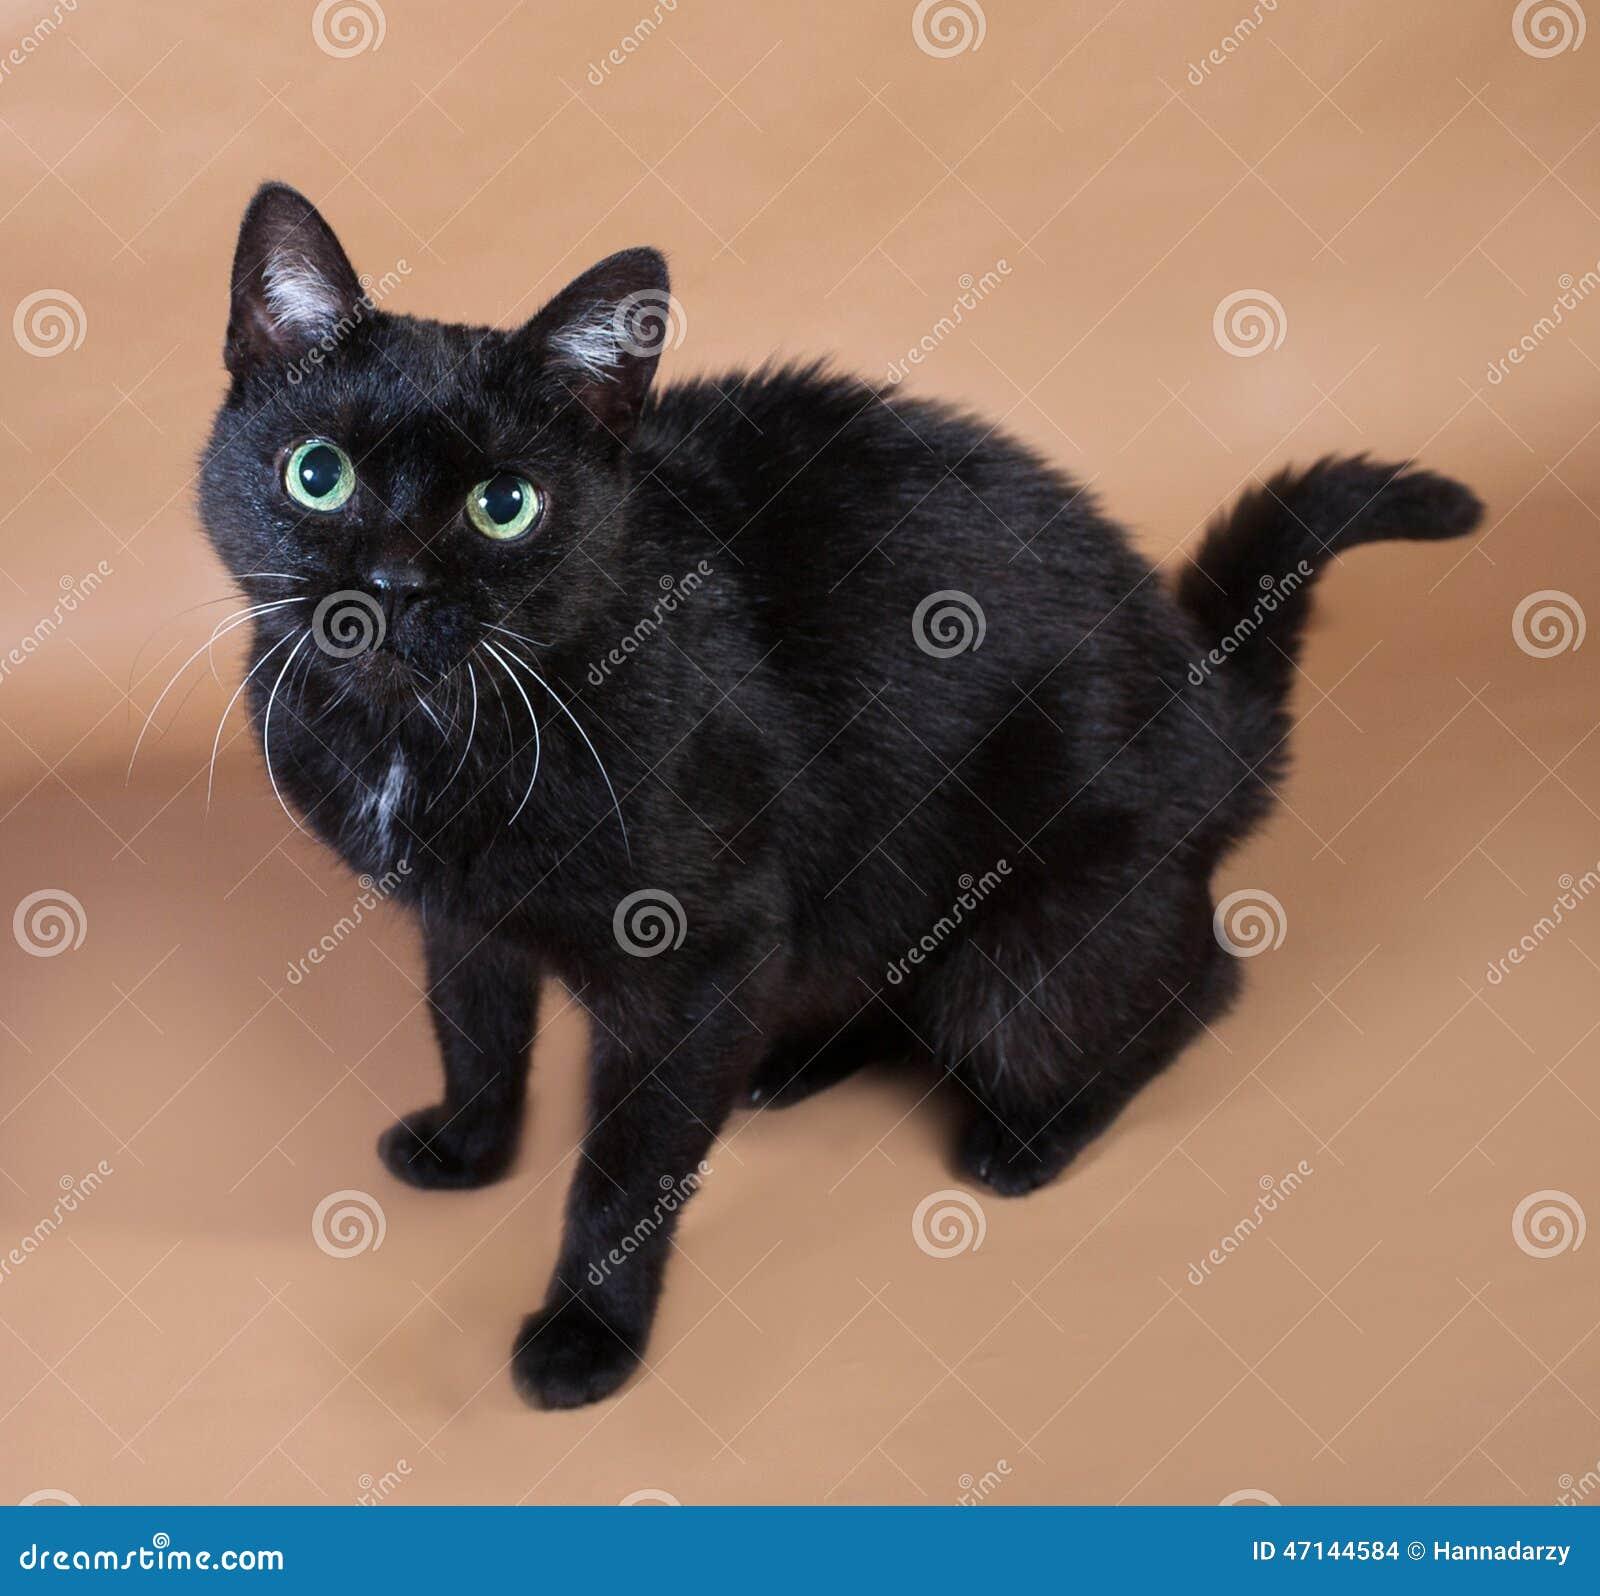 8f1ea0859f35 Μαύρη γάτα με τα πράσινα μάτια που κάθονται σε καφετή Στοκ Εικόνες ...